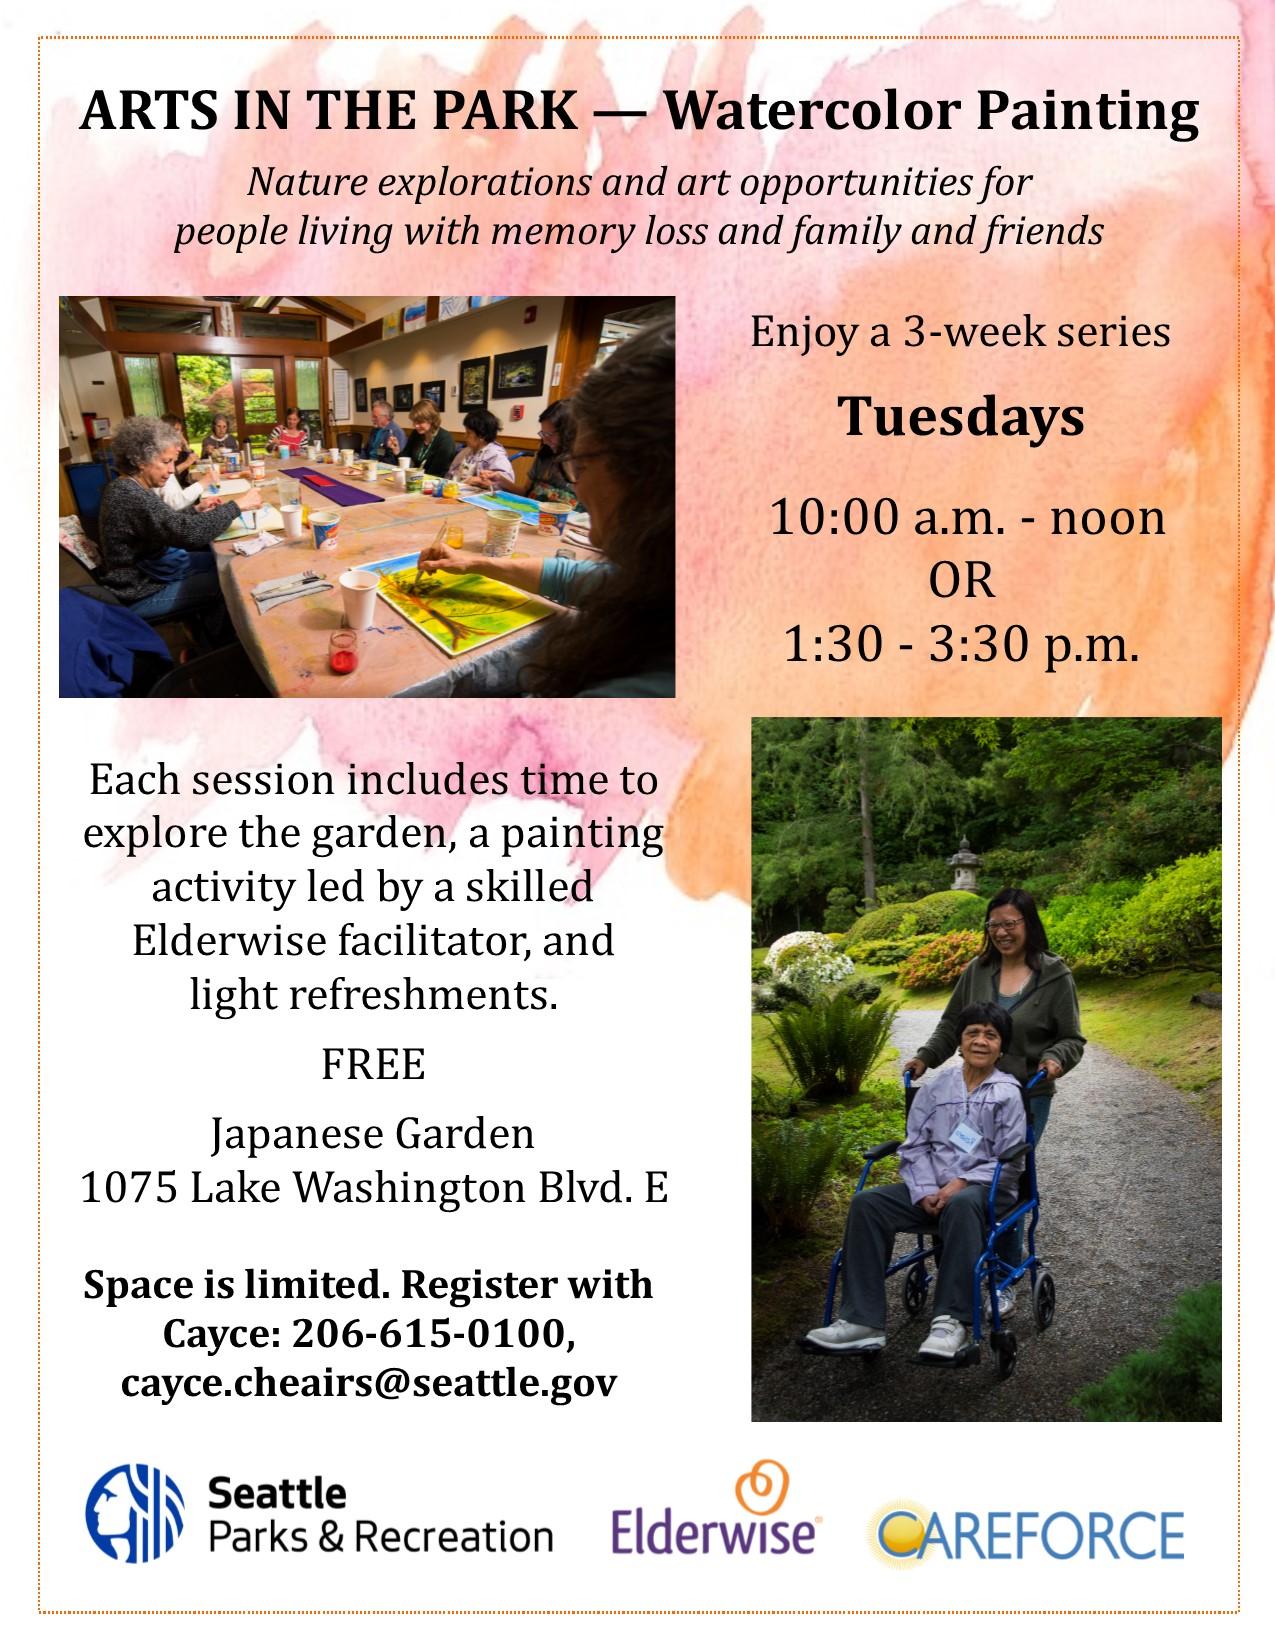 Arts in the Park Japanese Garden Flyer Generic Free.jpg